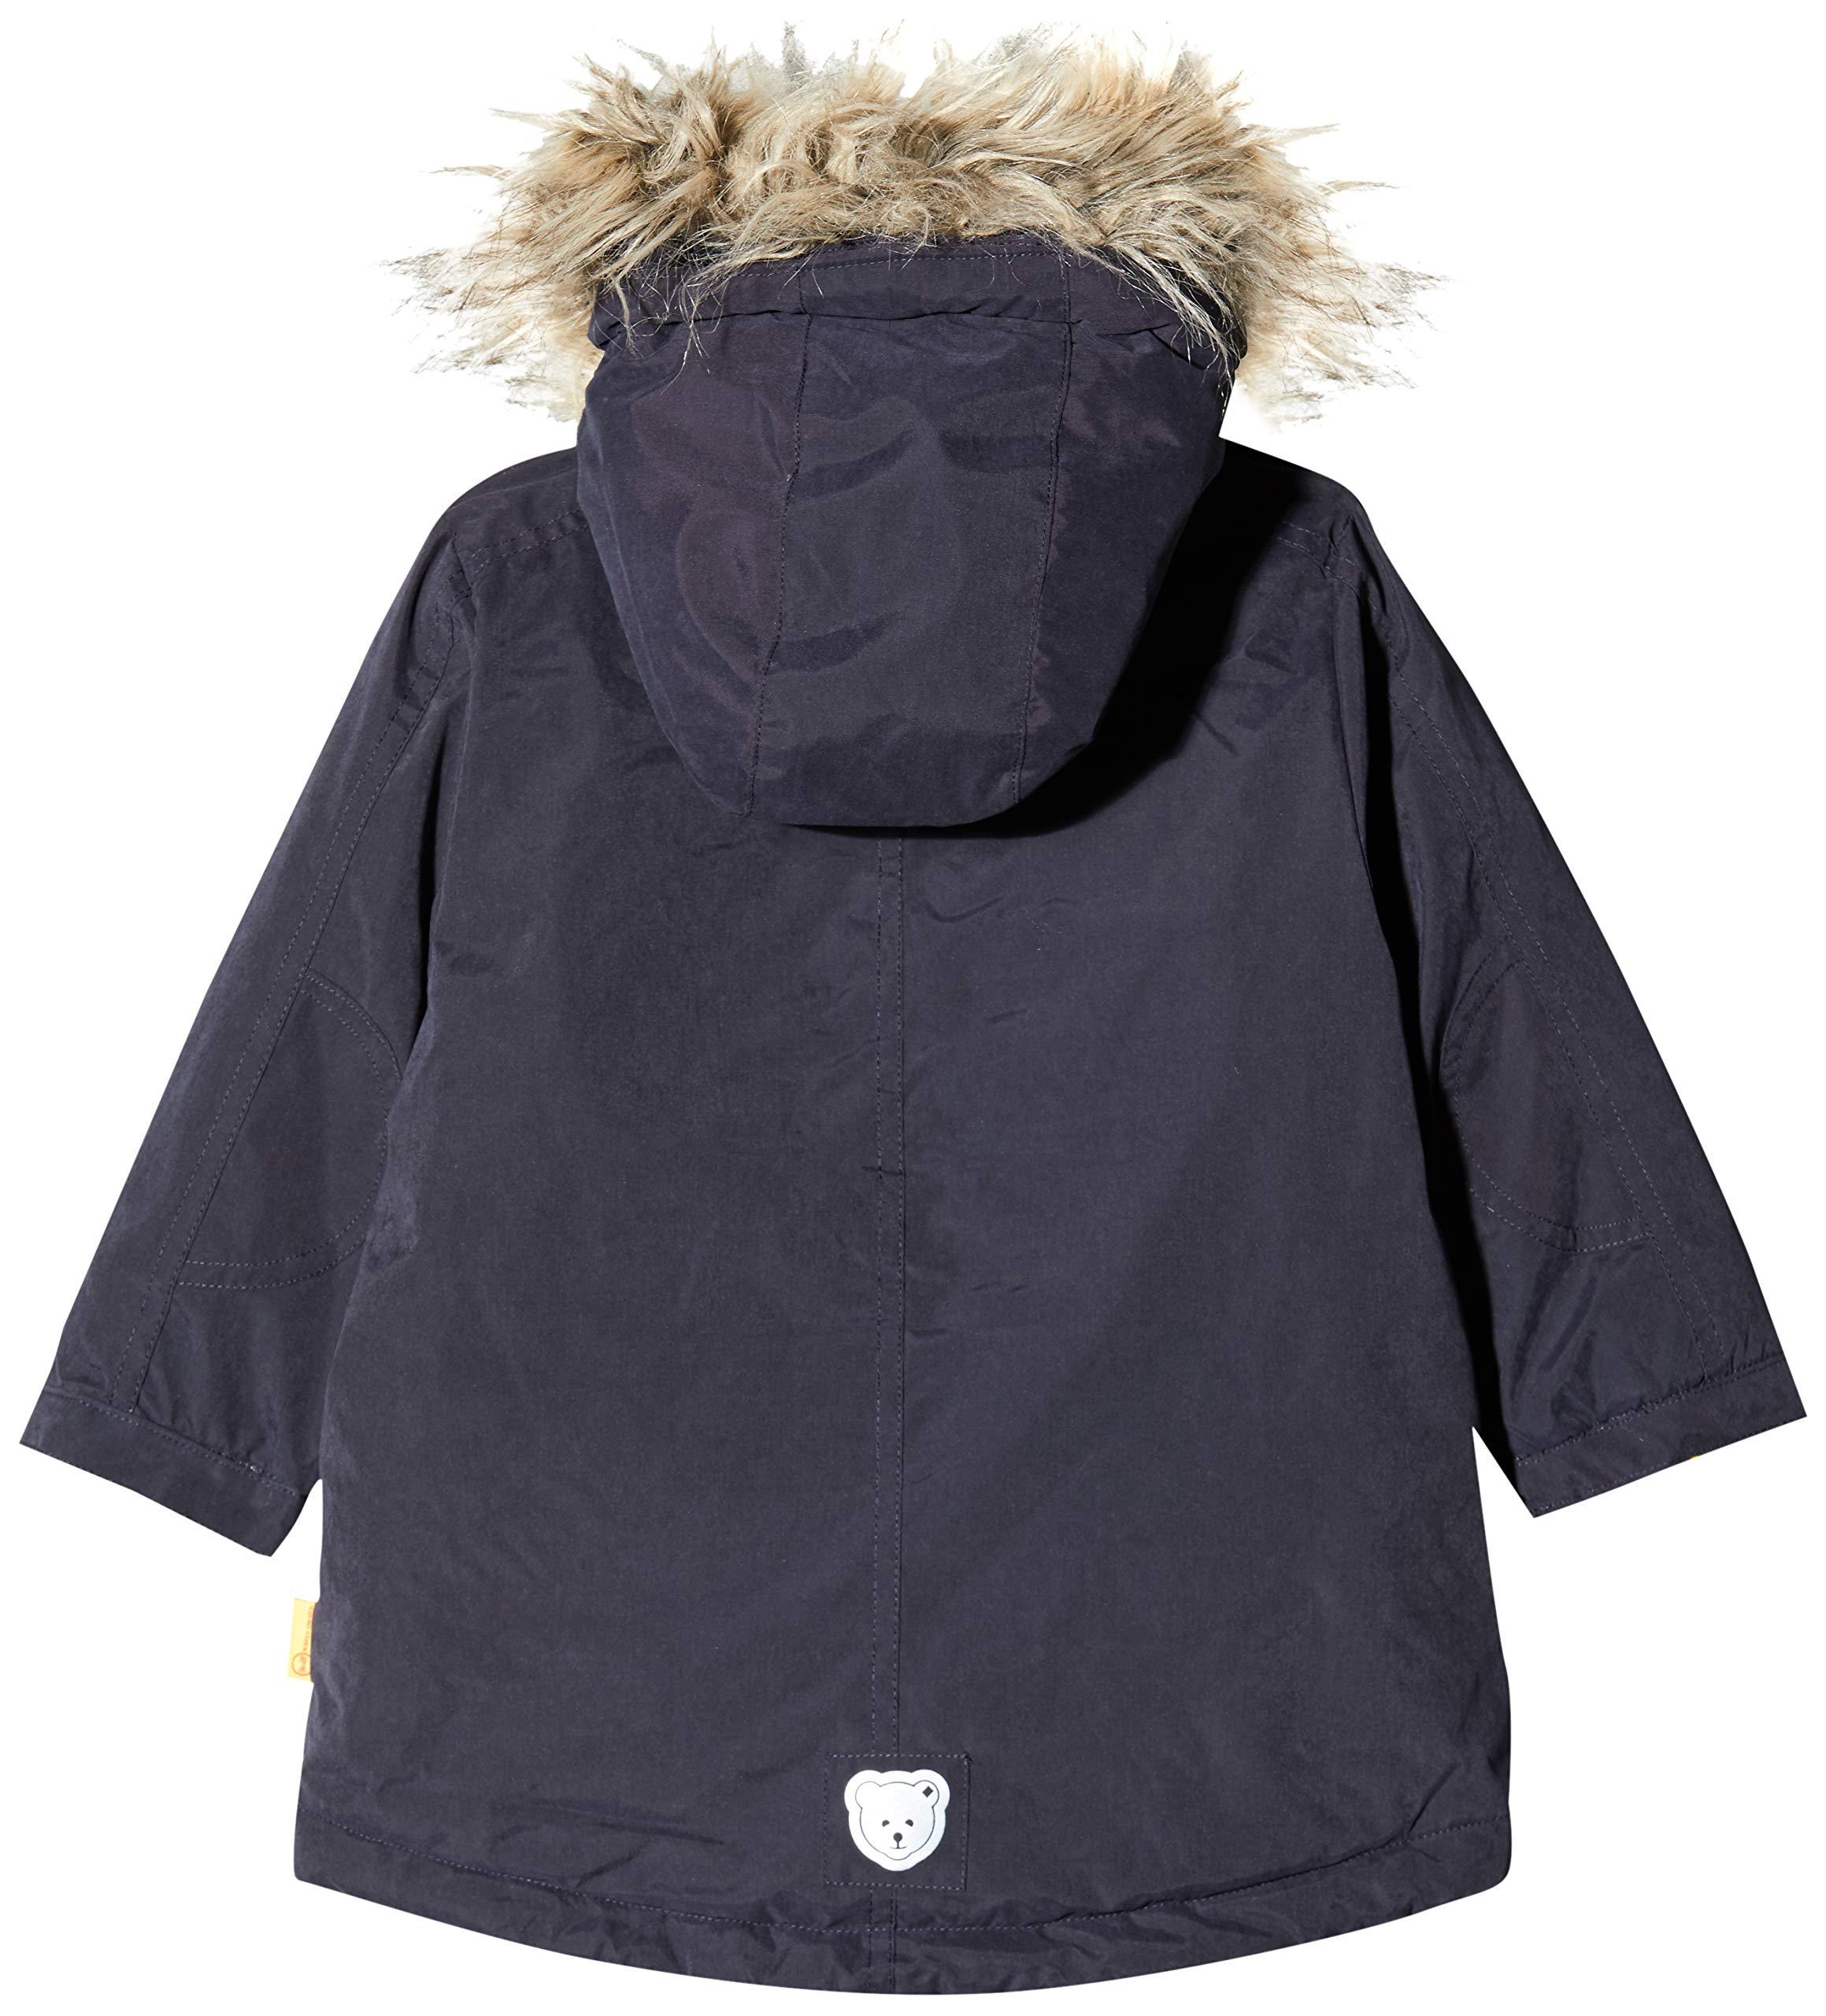 Steiff Jacket Chaqueta para Bebés 2